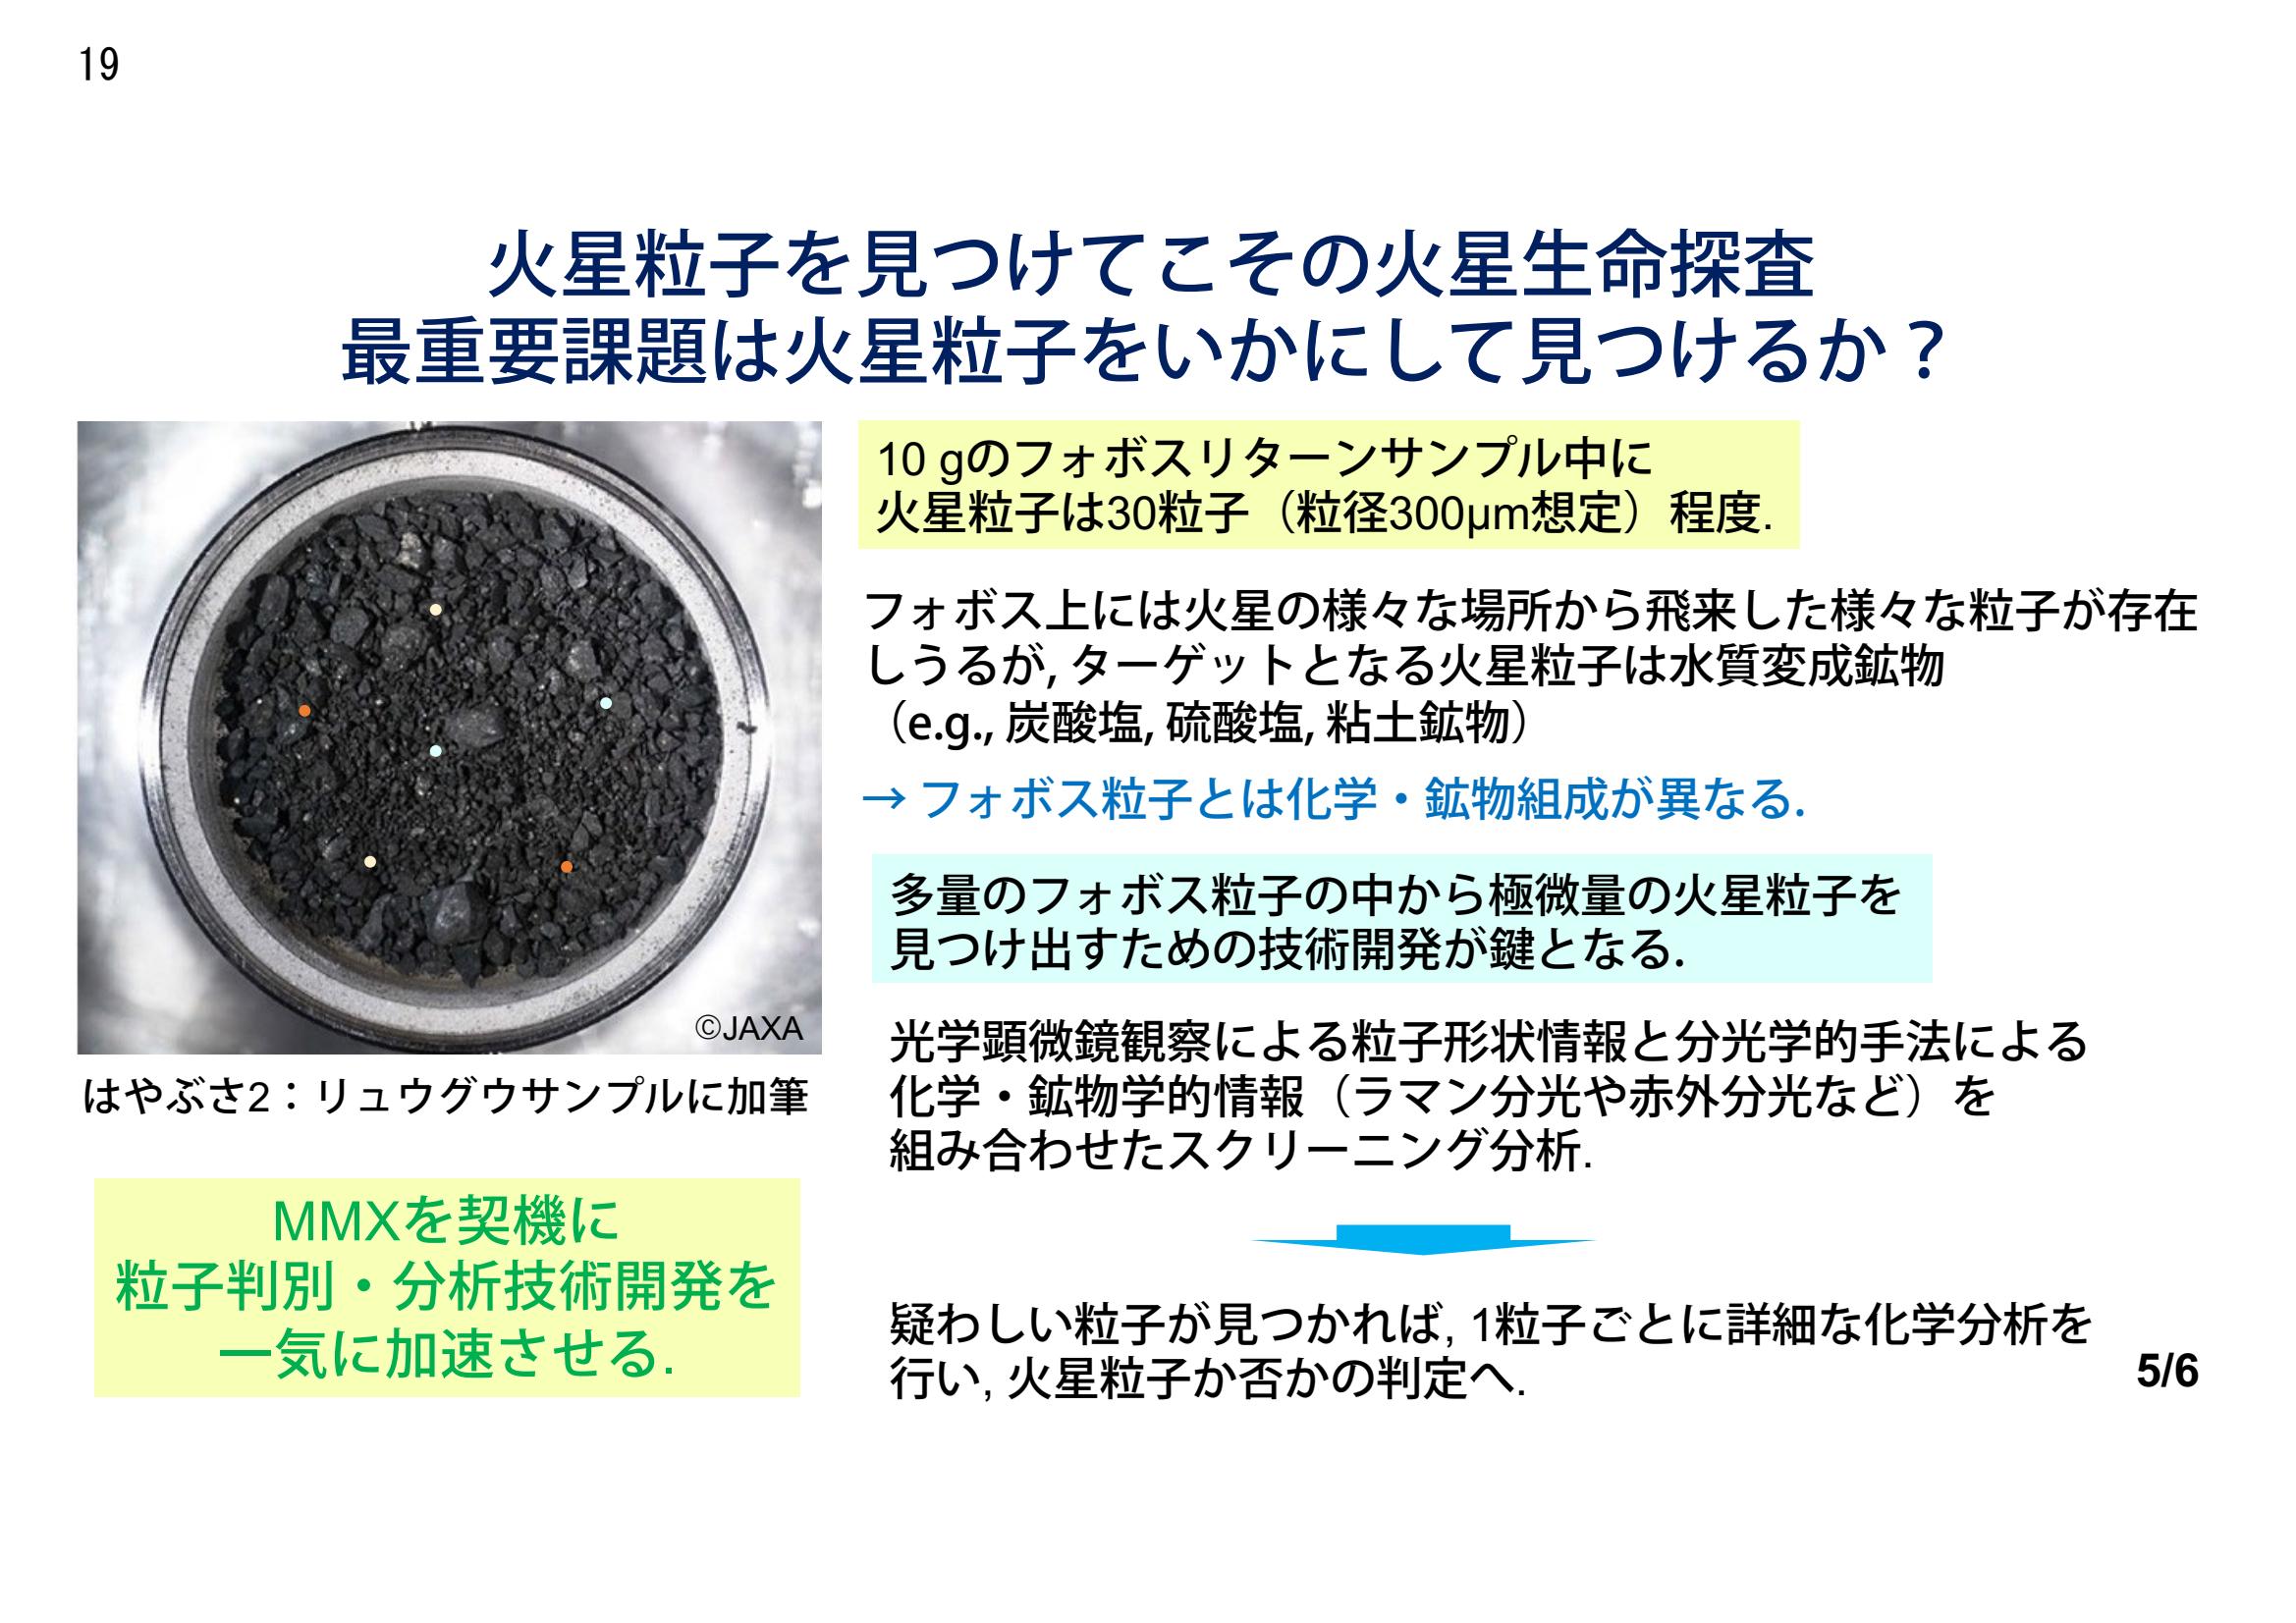 f:id:Imamura:20210819095623p:plain